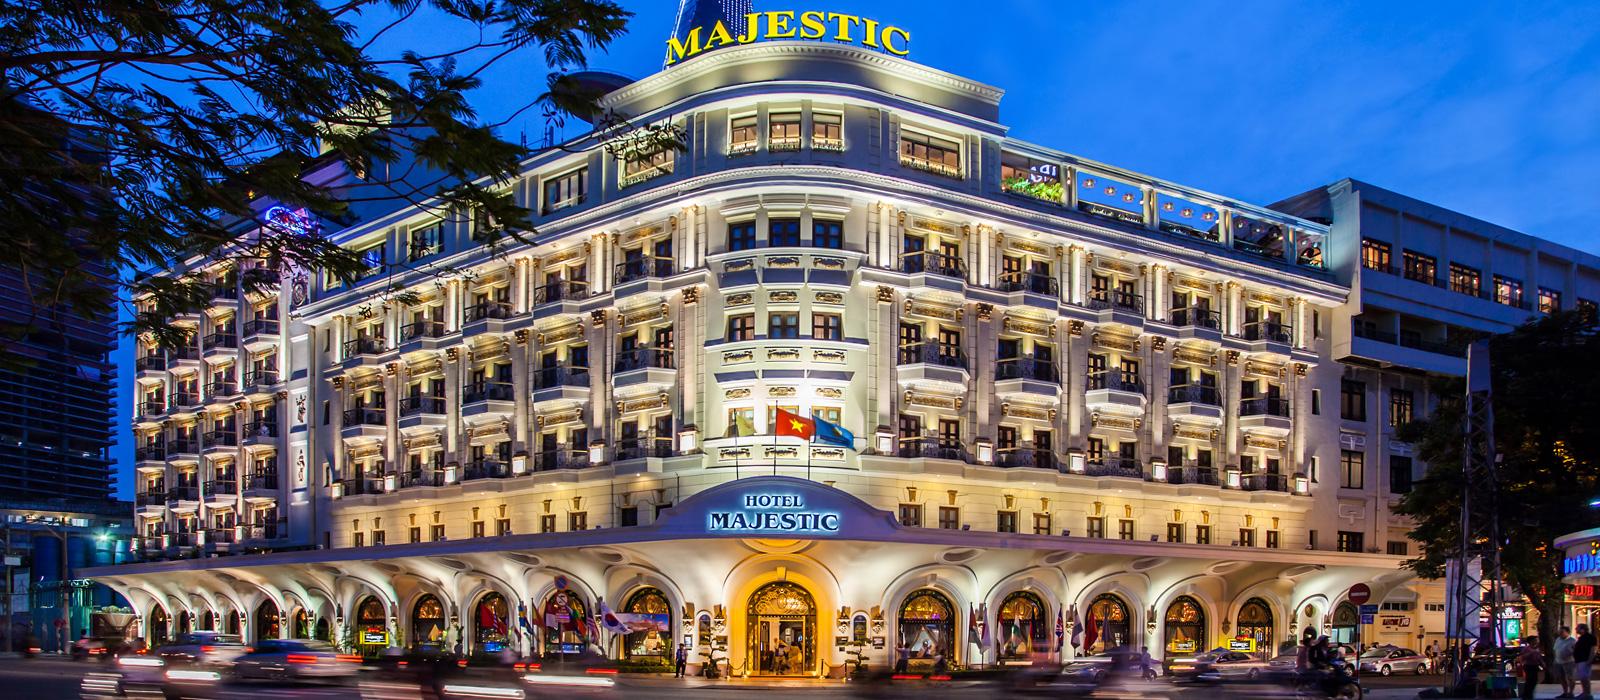 Đặt phòng Majestic Hotel